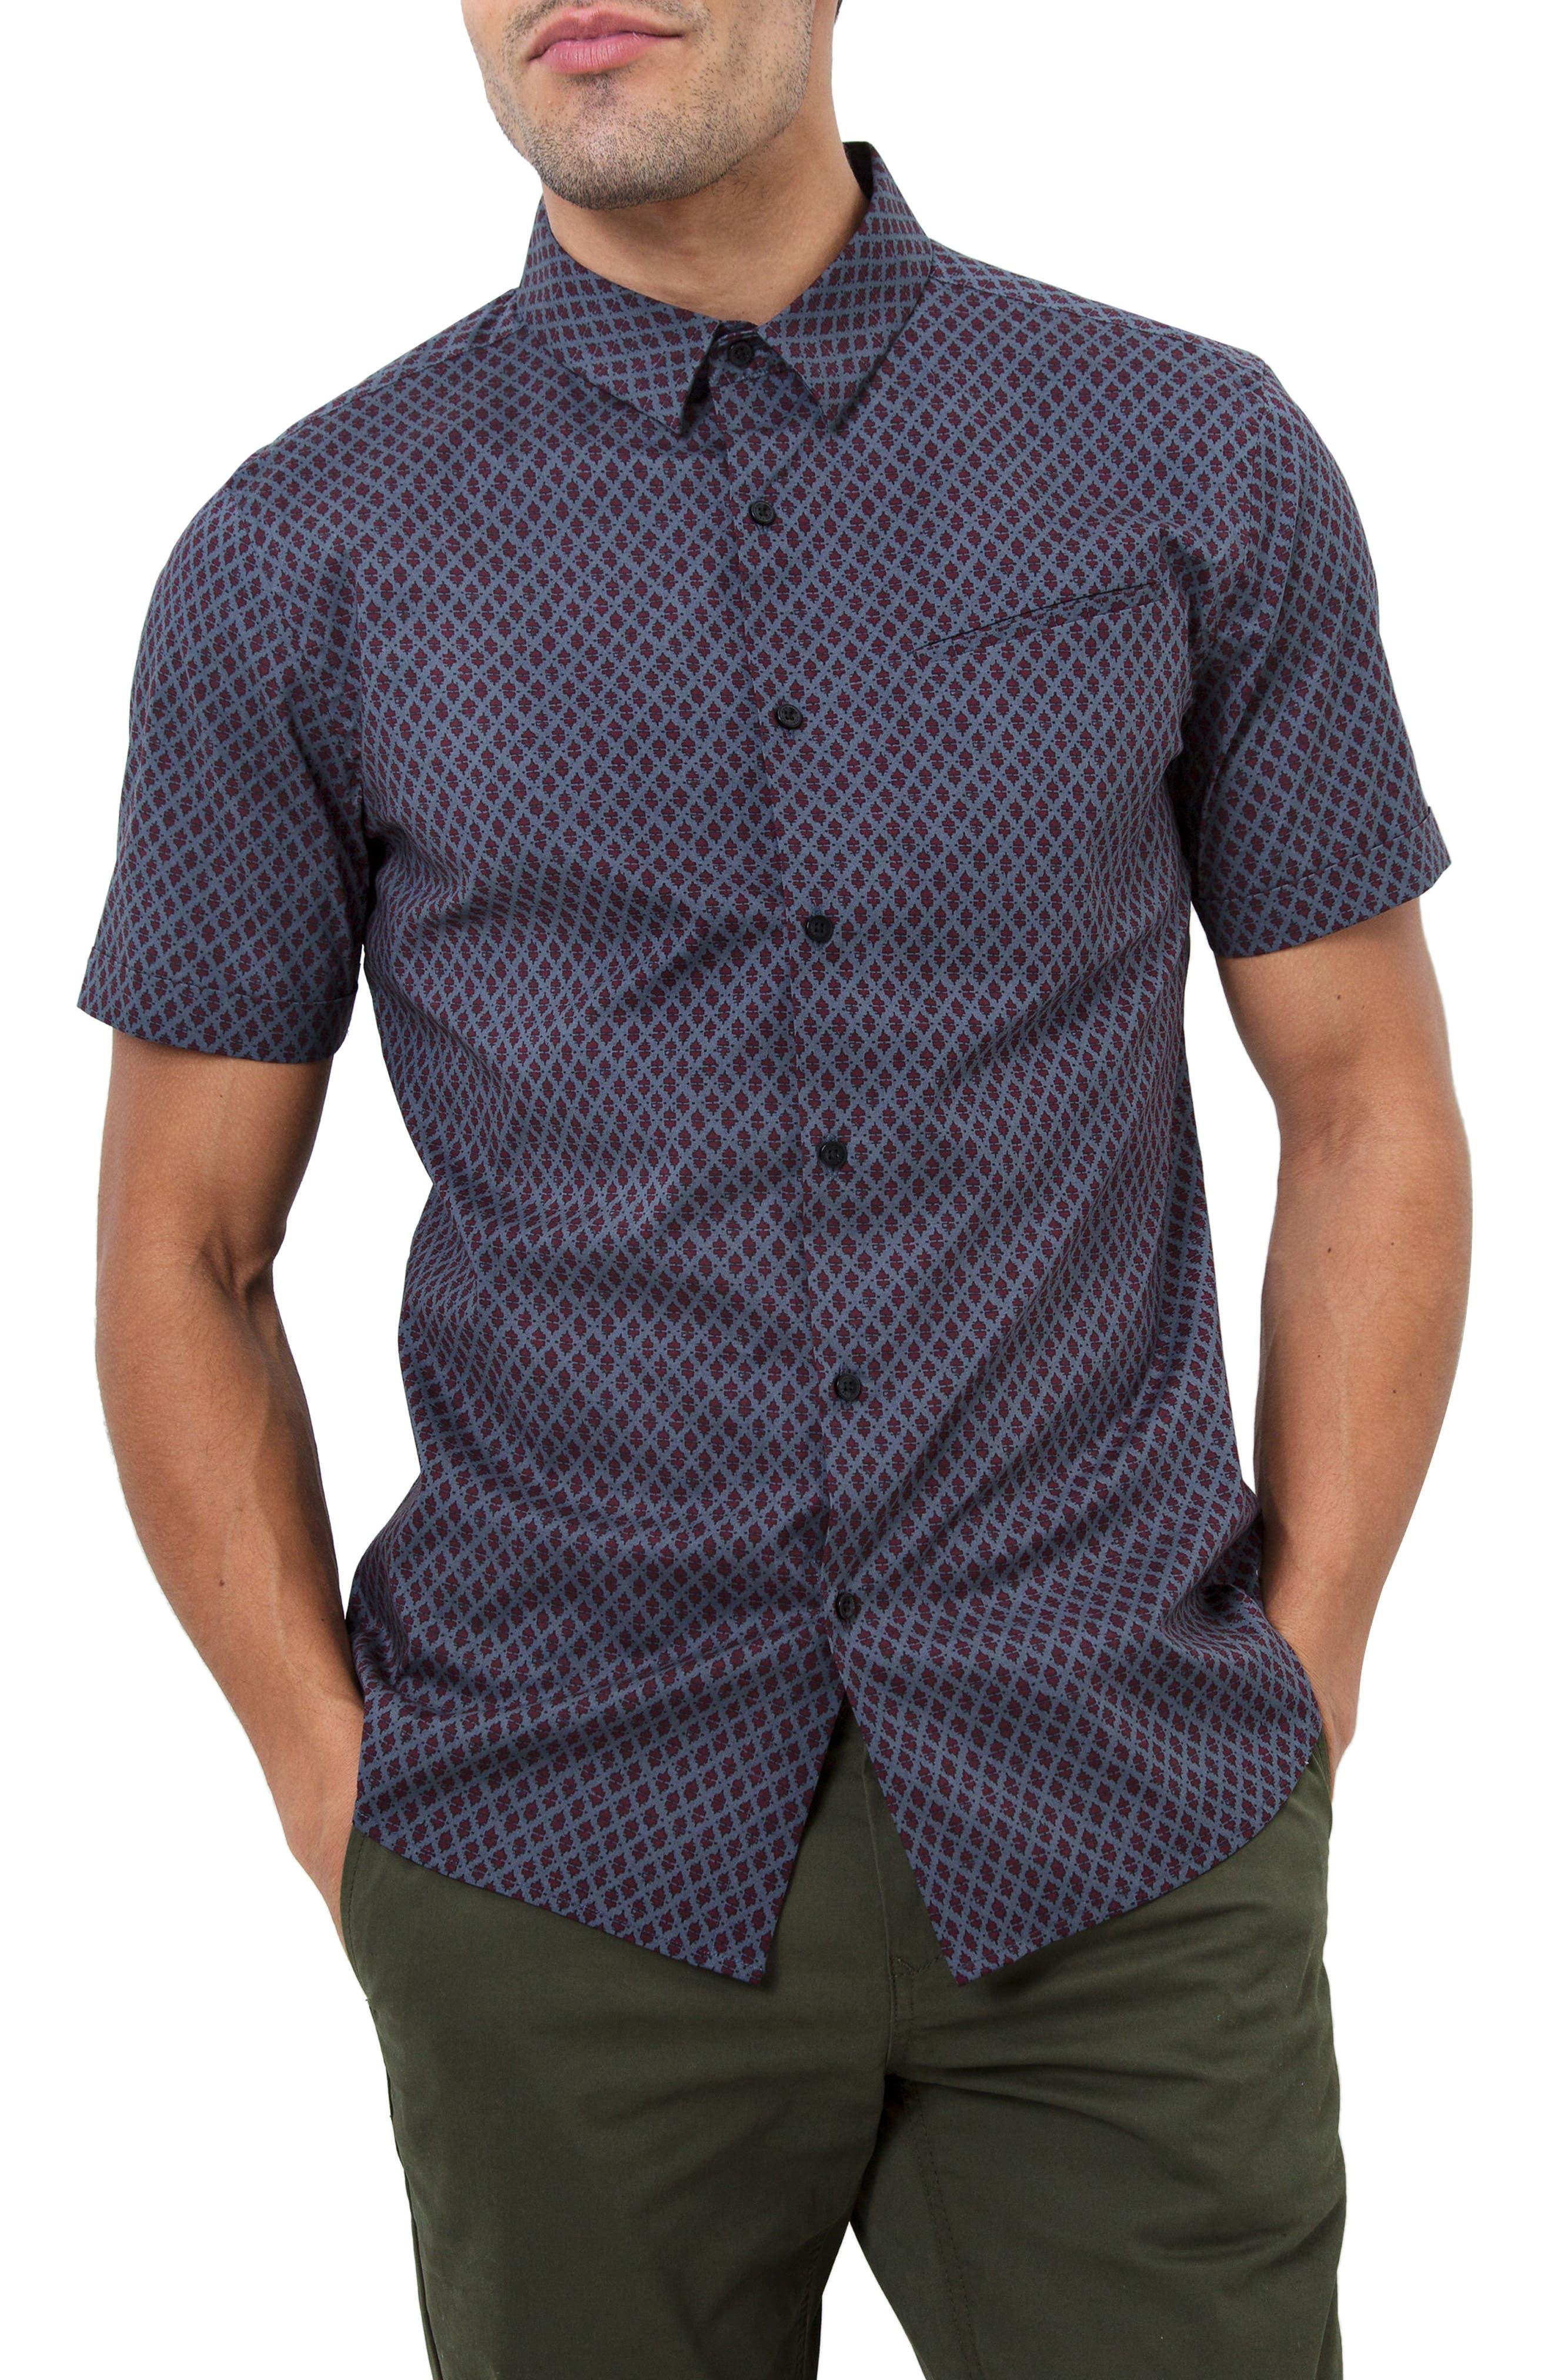 Dancing Mood Woven Shirt,                         Main,                         color, 410